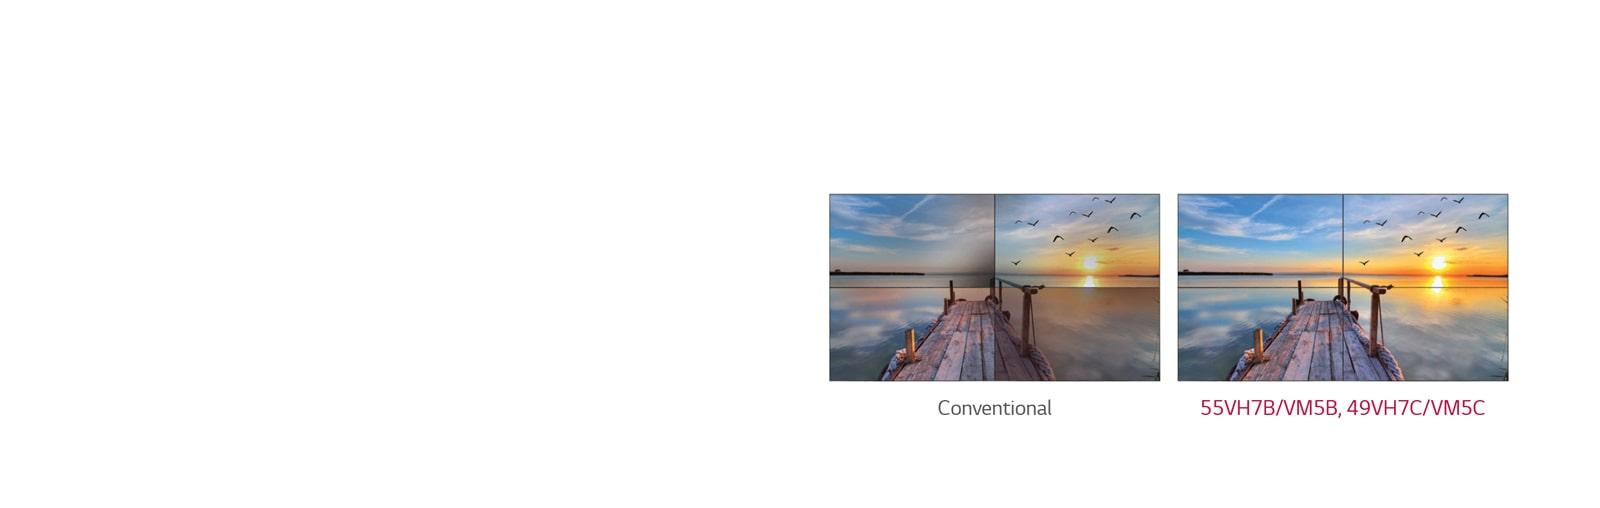 Video-Wall-Image-Creation_1479109006134